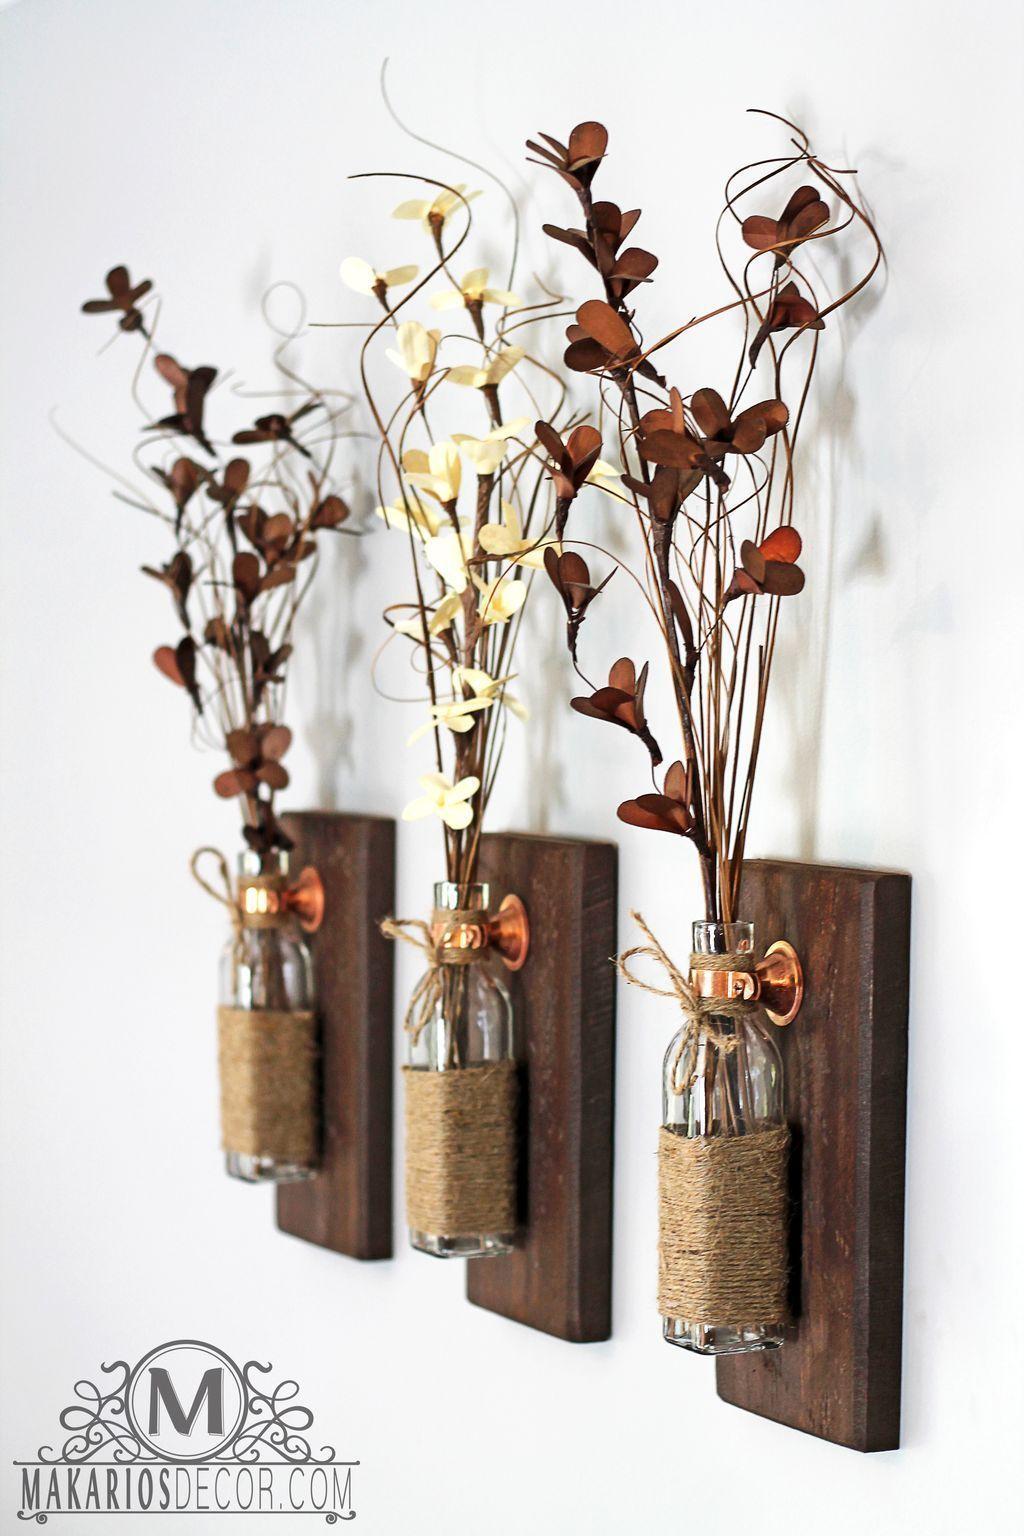 Rustikales badezimmer dekor diy creative diy rustic home decor ideas on a budget   diy projects